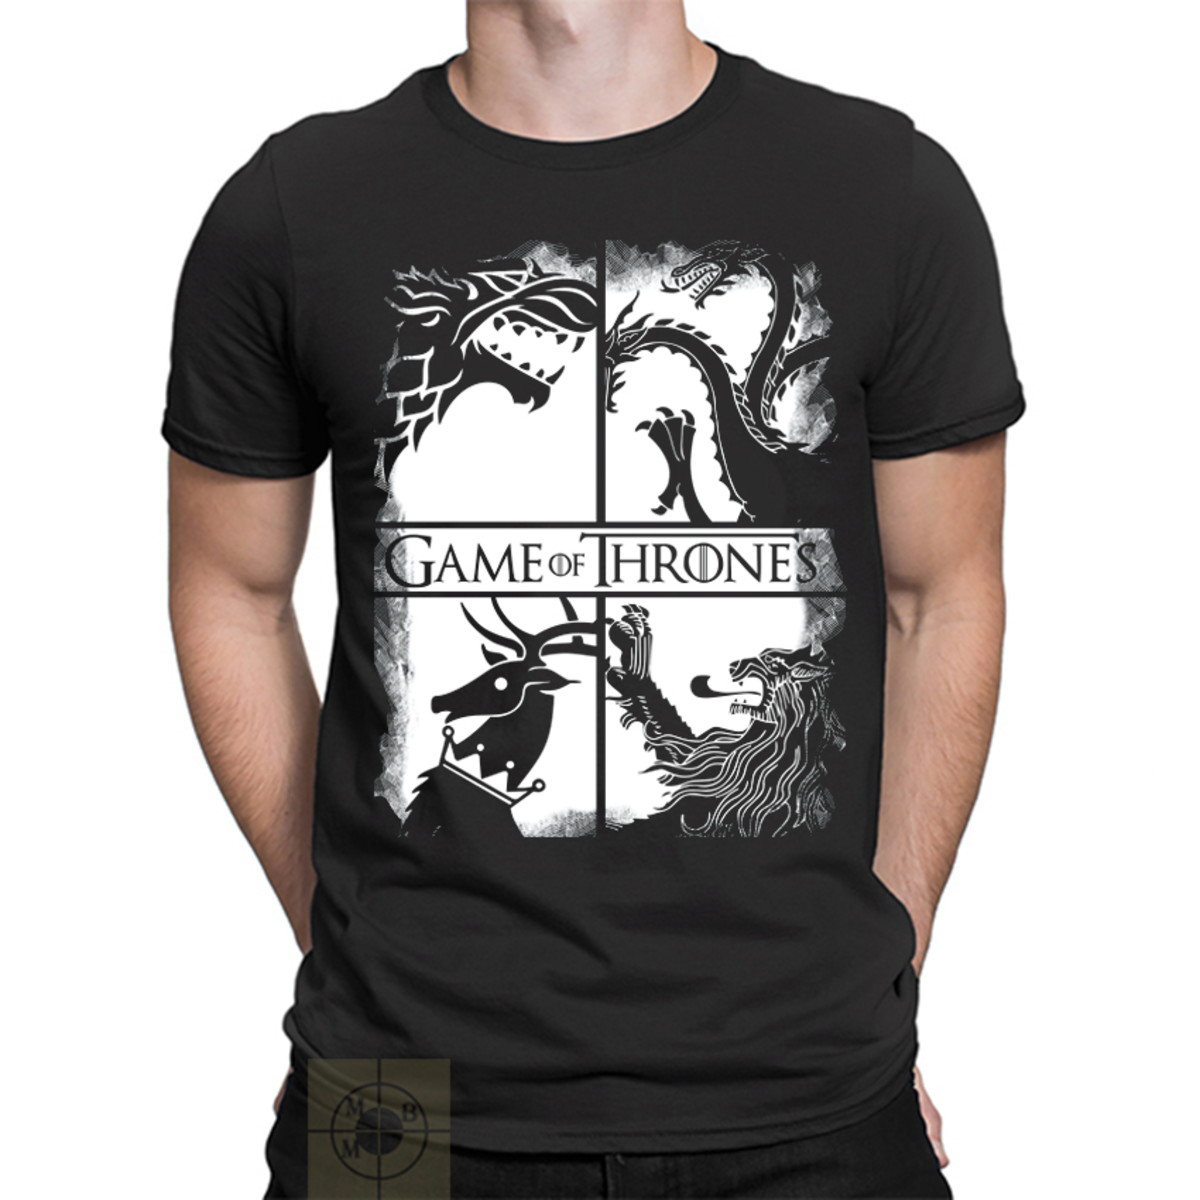 127b8c17f Camiseta Masculina Game Of Thrones Stark no Elo7